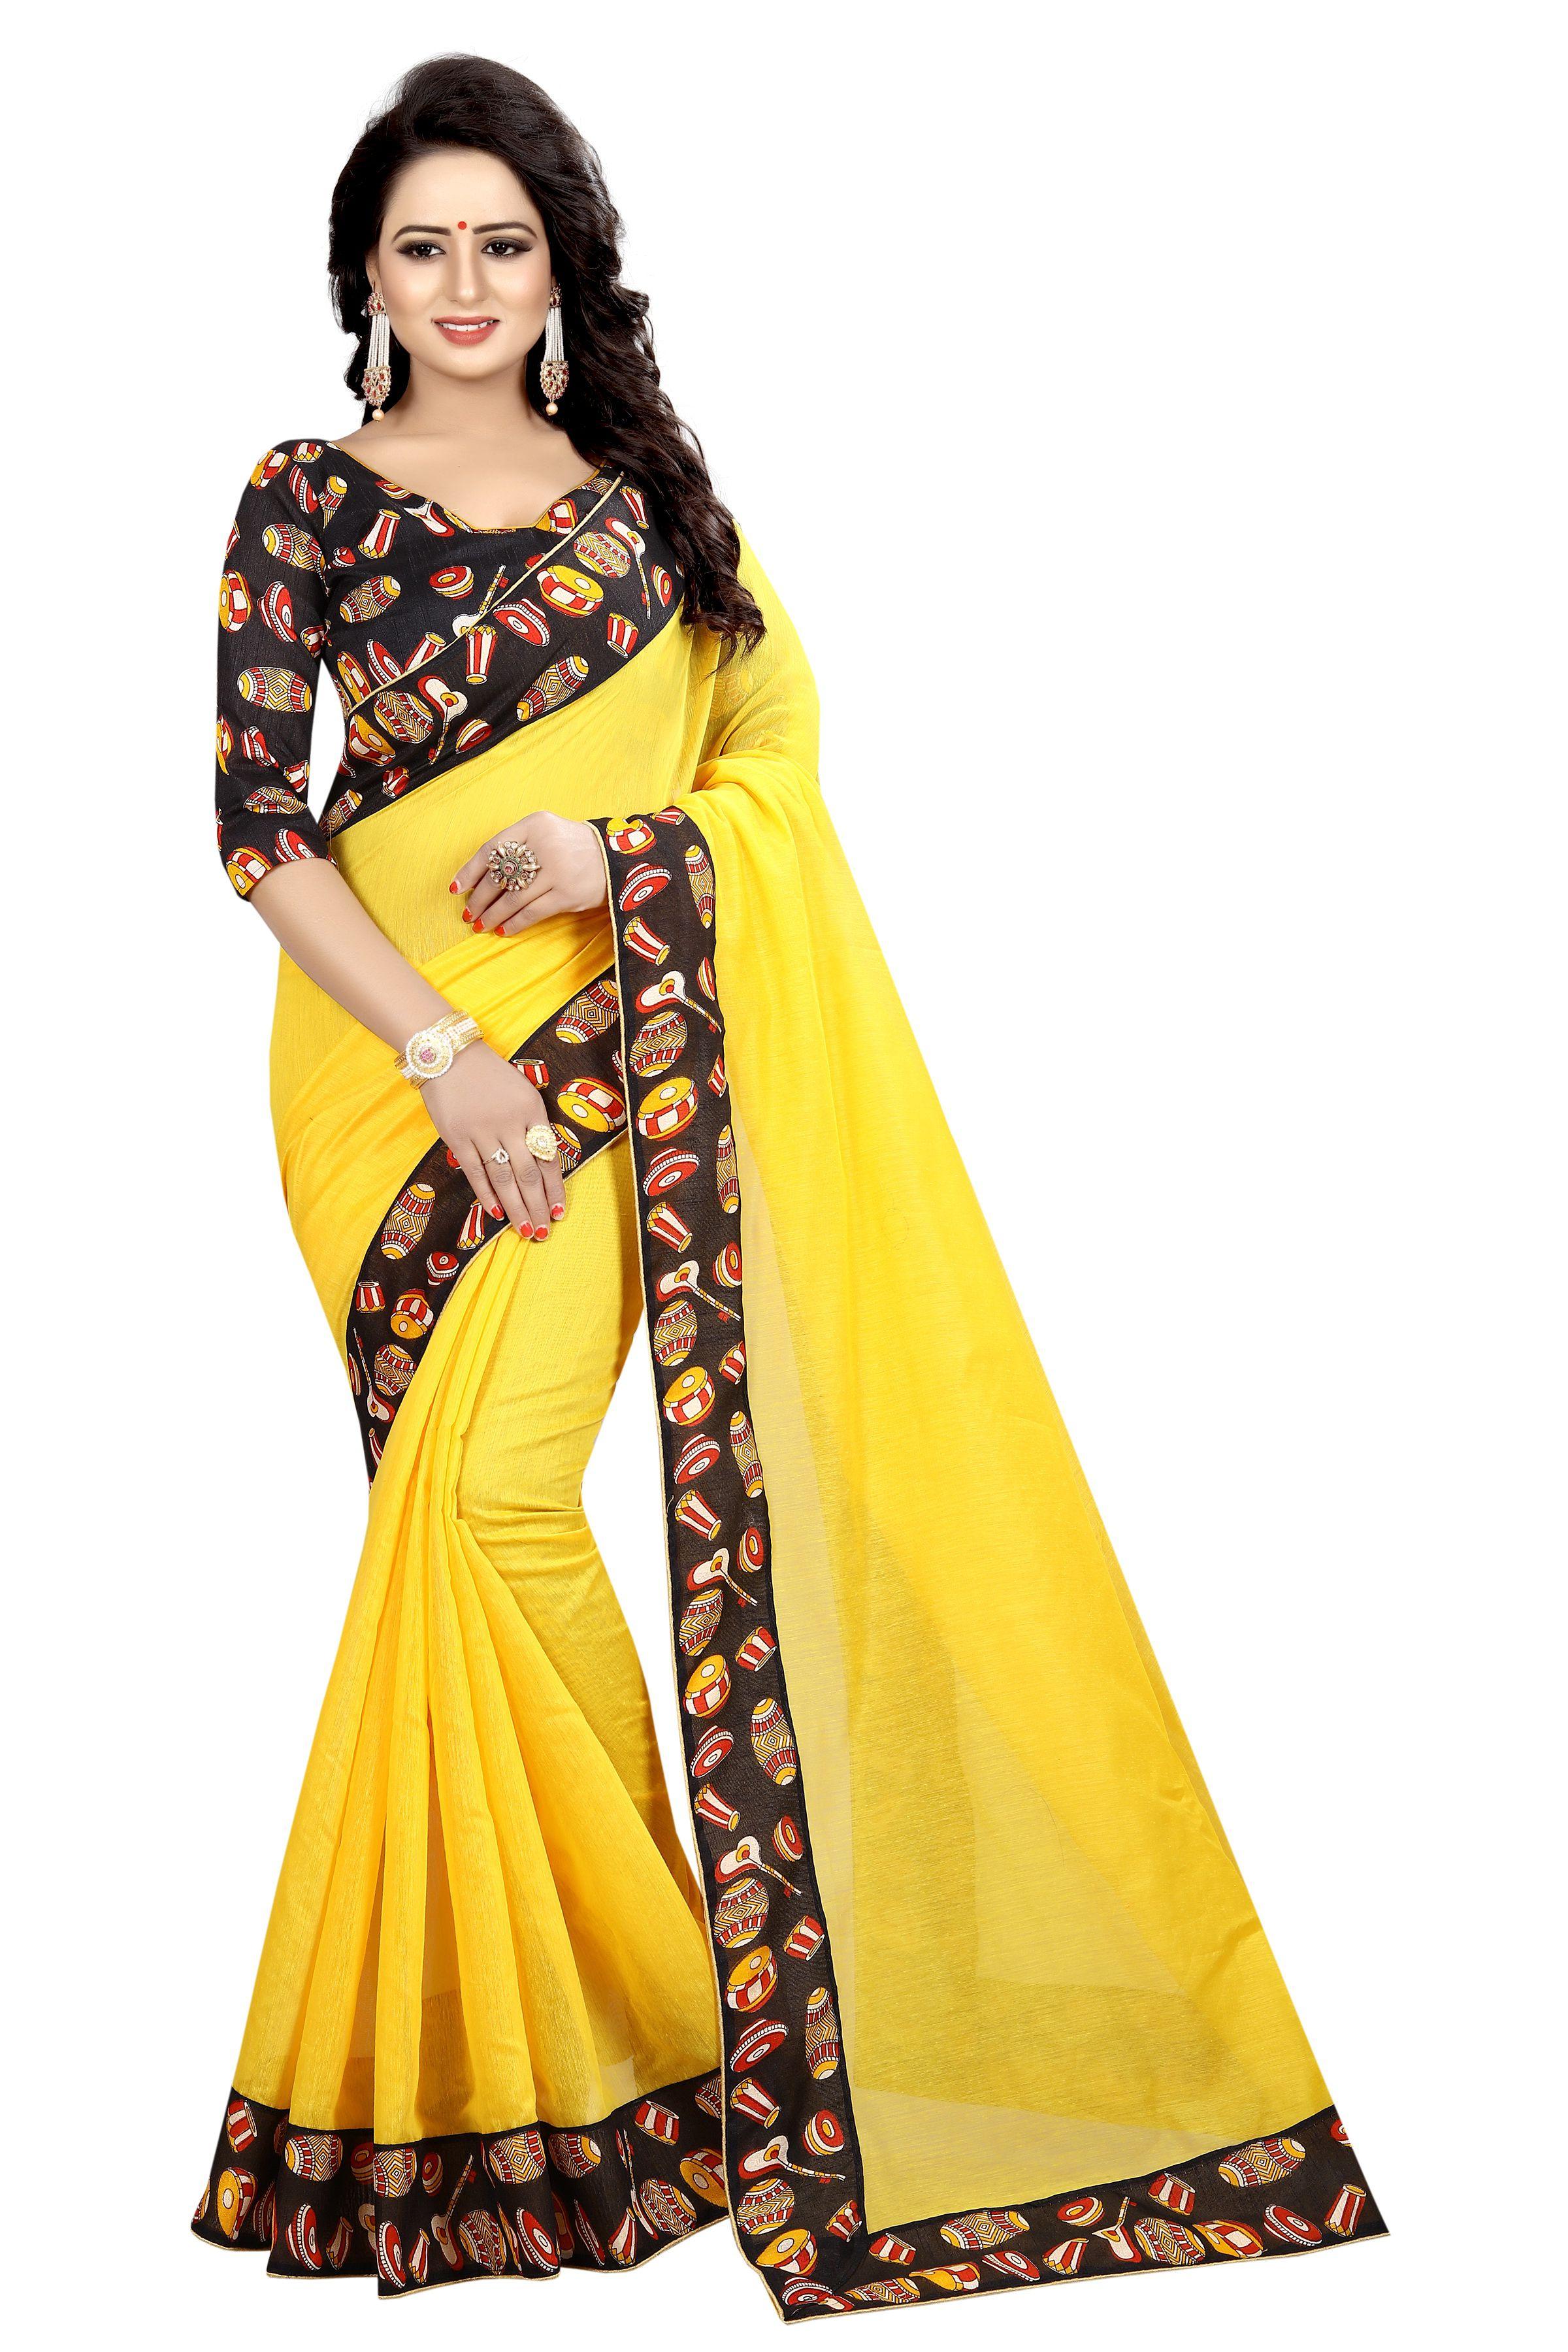 Winza Designer Yellow and Black Chanderi Saree